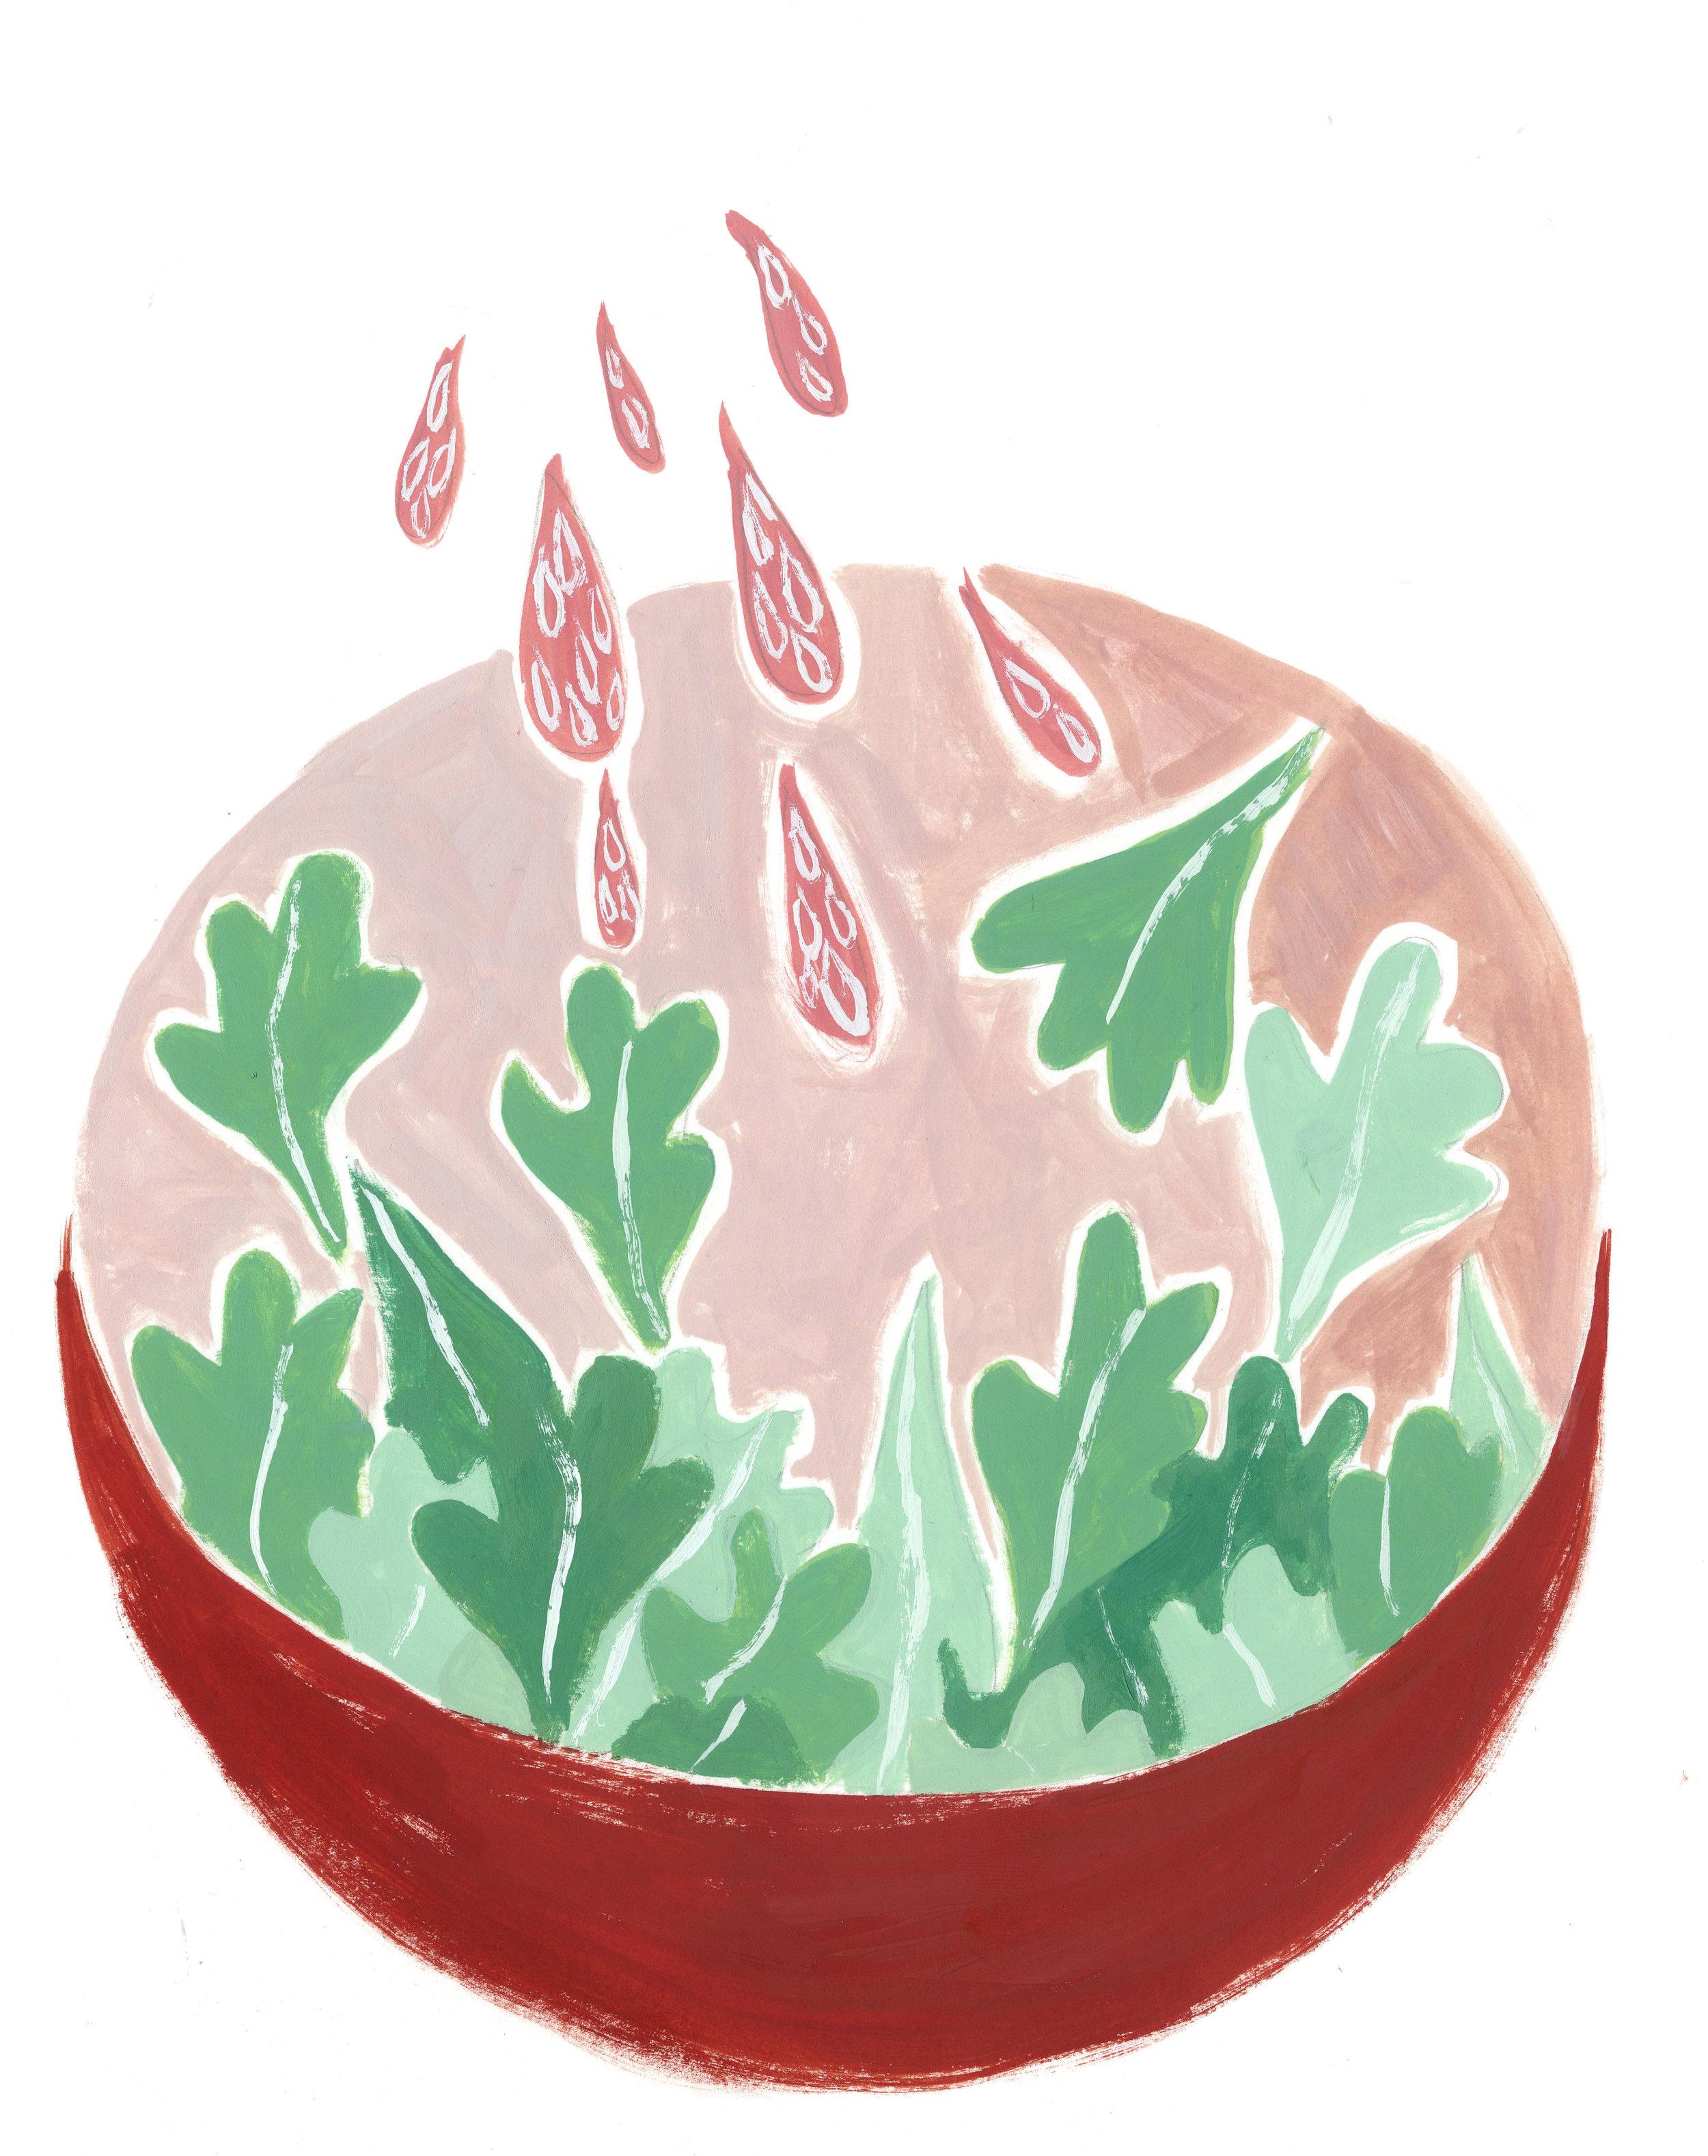 Salad Bowl copy.jpg